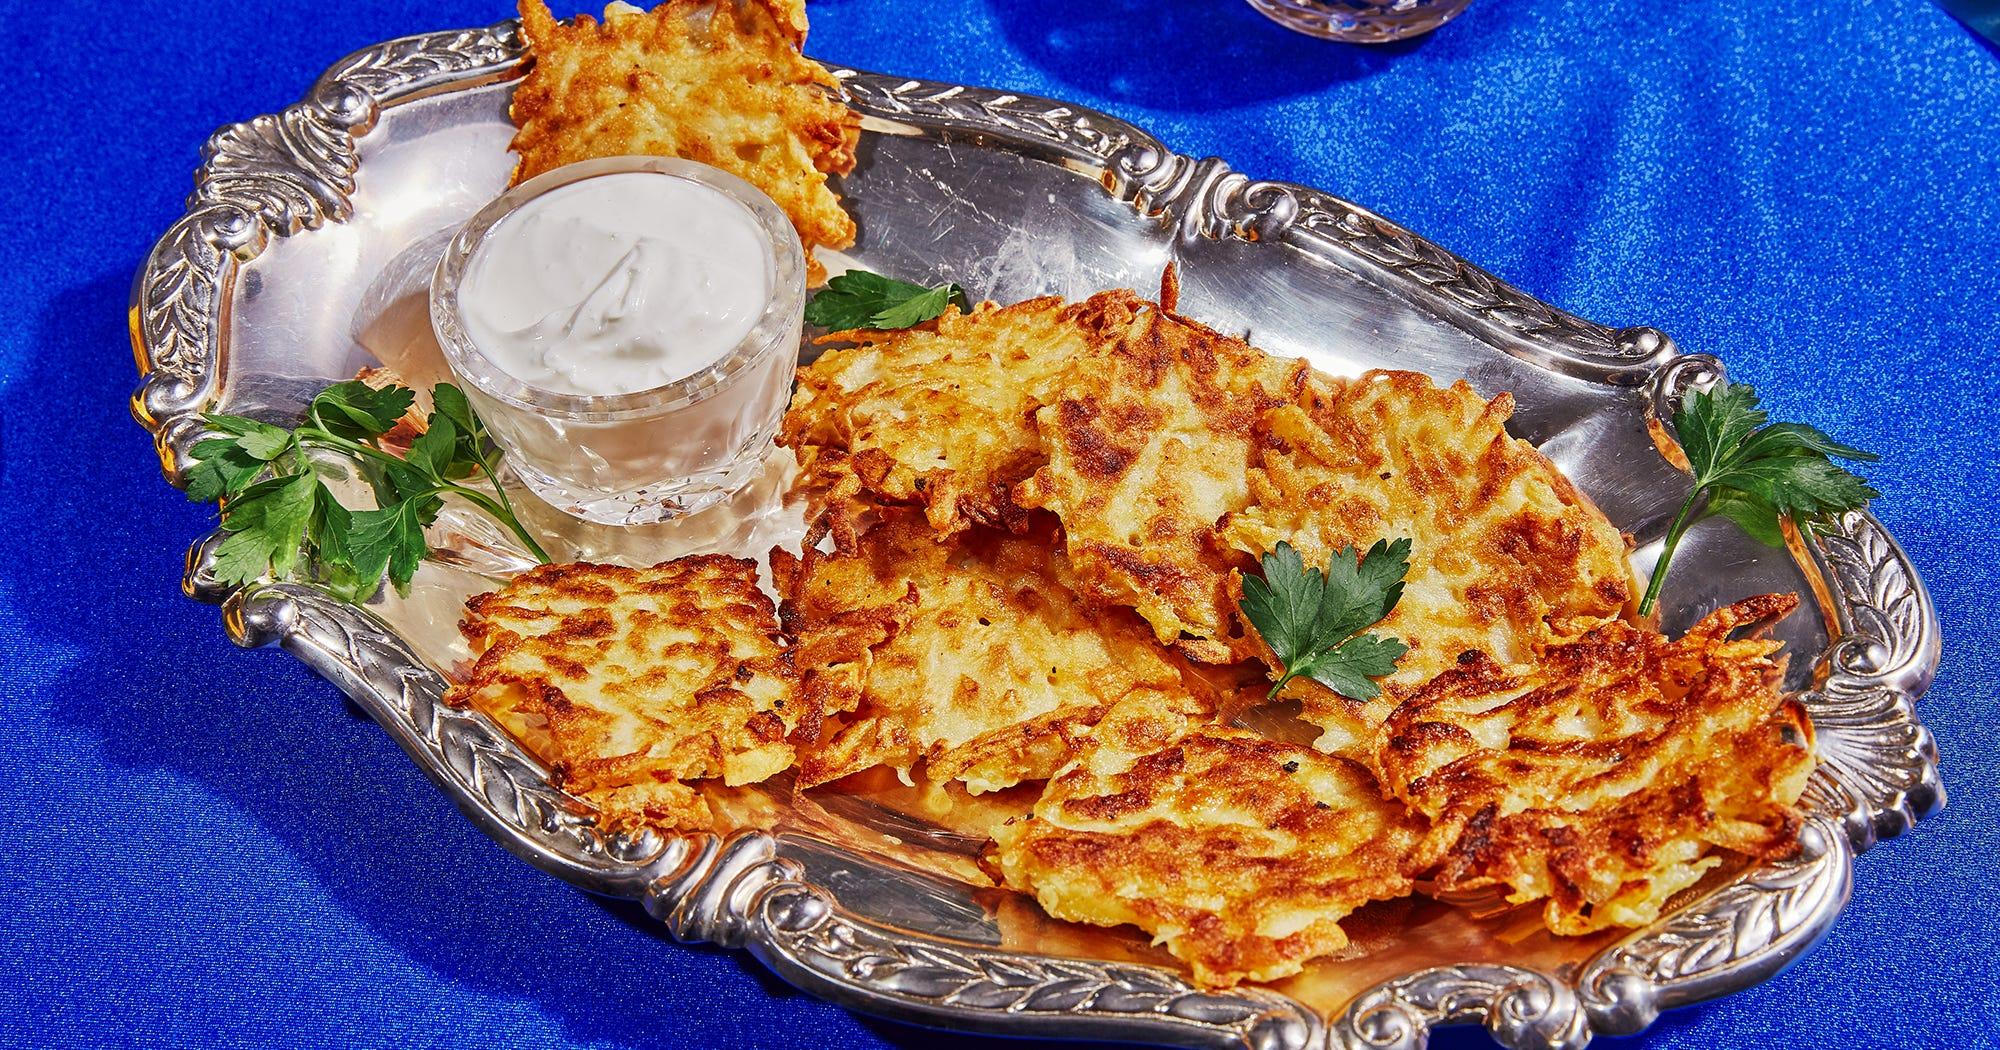 Best Hanukkah Recipes & Most Popular Food Dishes 2018